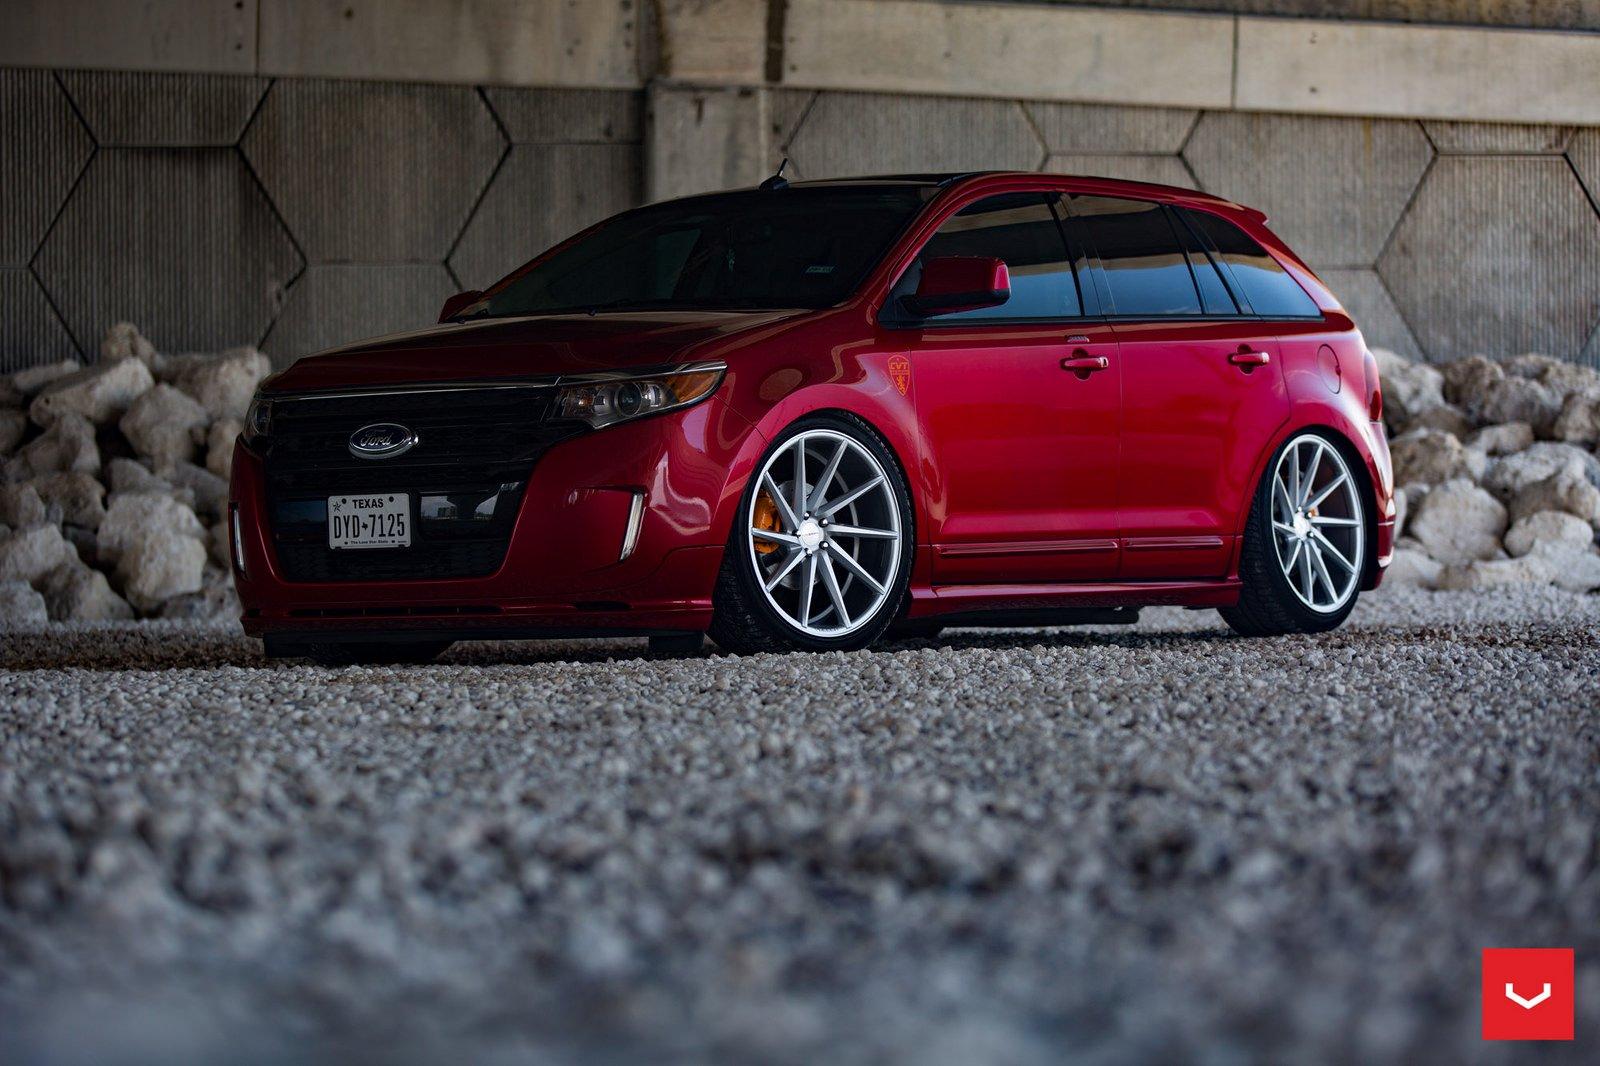 Ford Edge Wheels Cars Suv Red Wallpaper 1600x1066